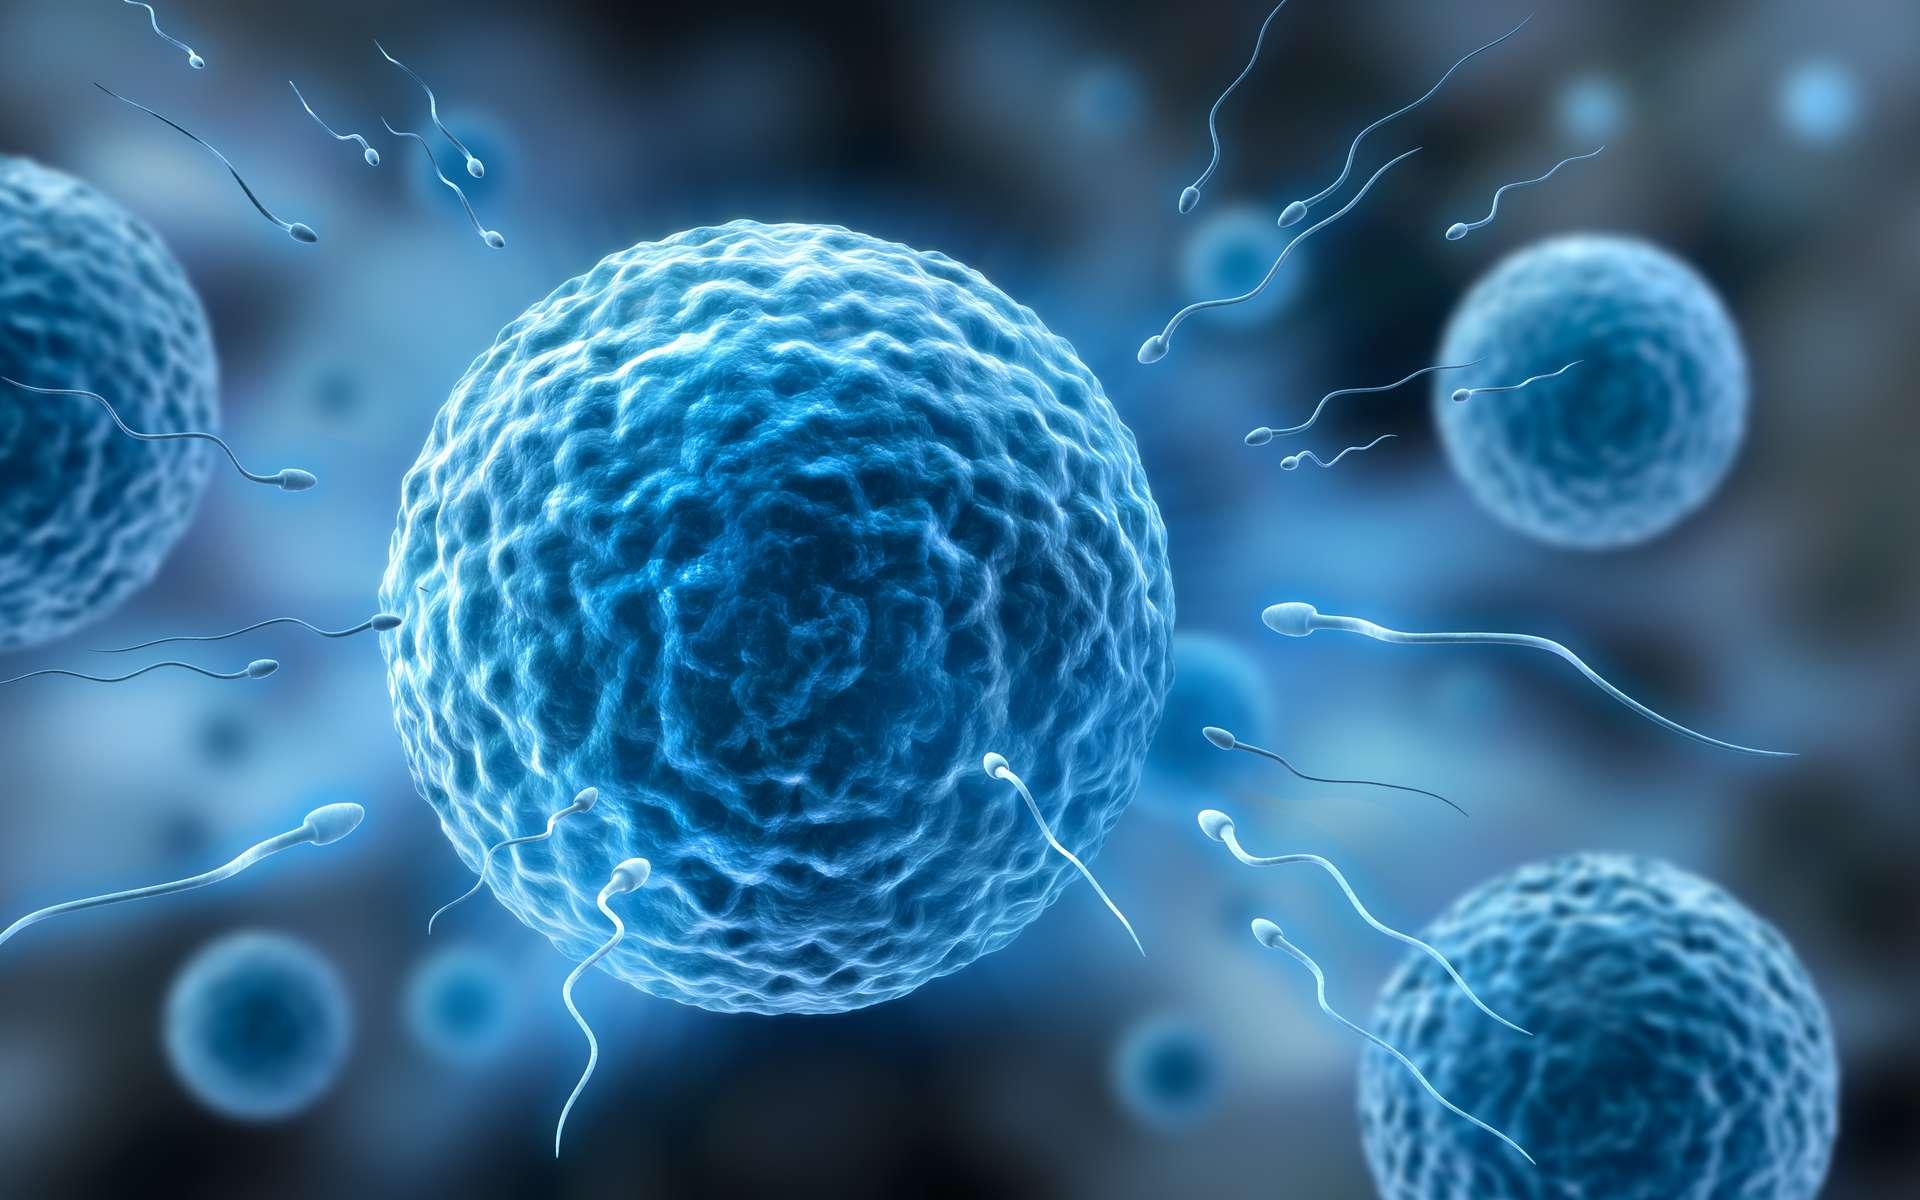 Illustration de spermatozoïdes nageant vers un ovule. © peterschreiber.media